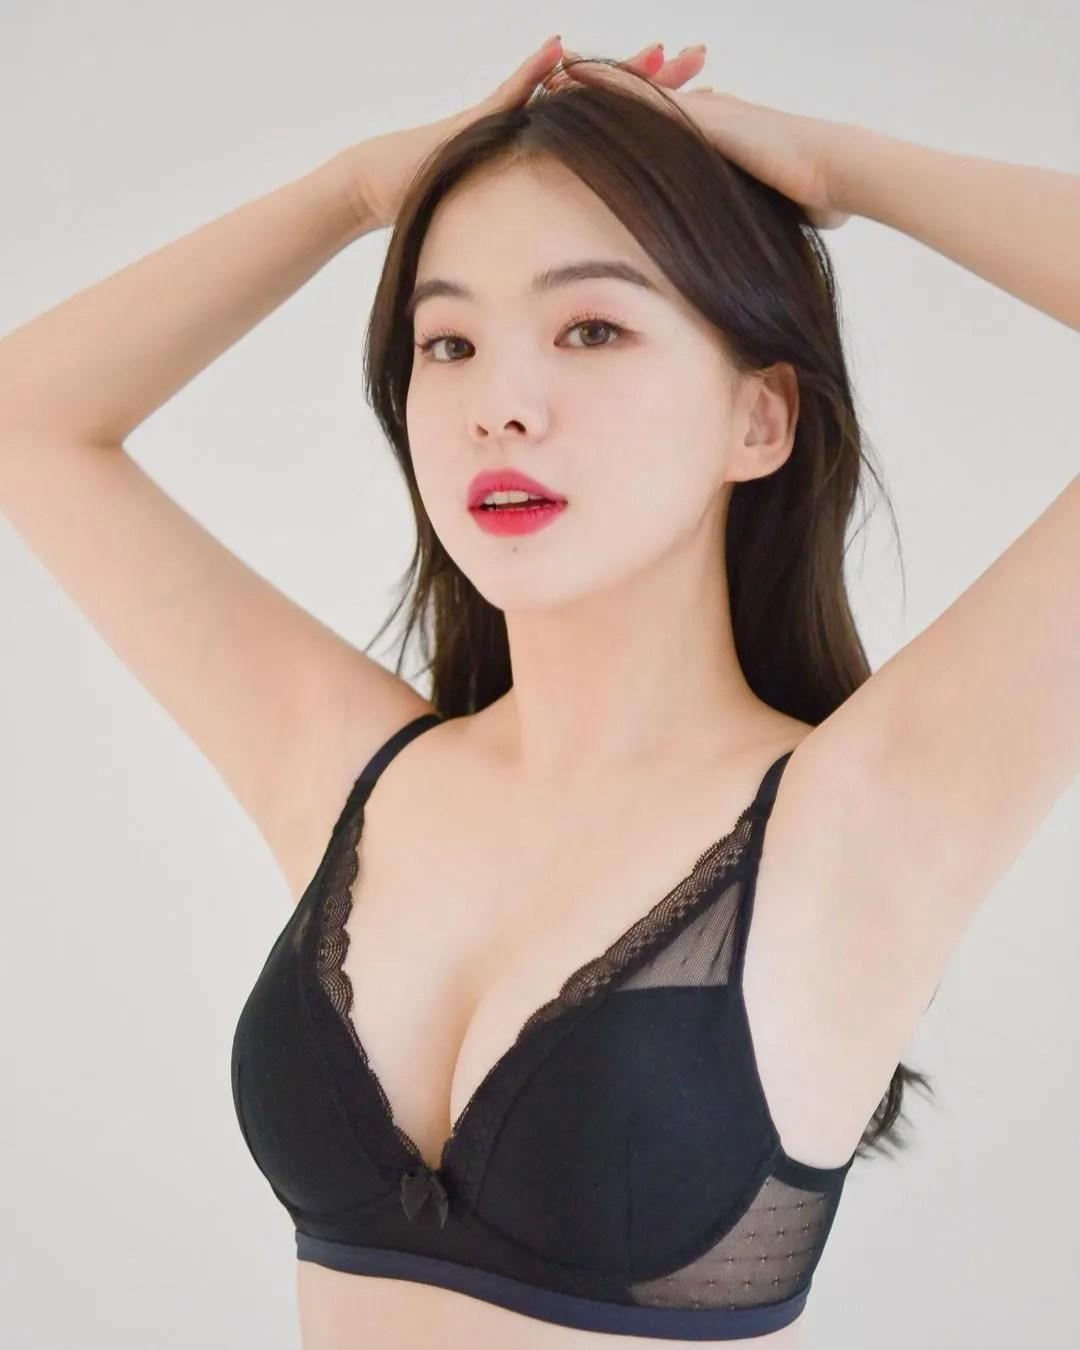 Lee Haneul (Haneulina)